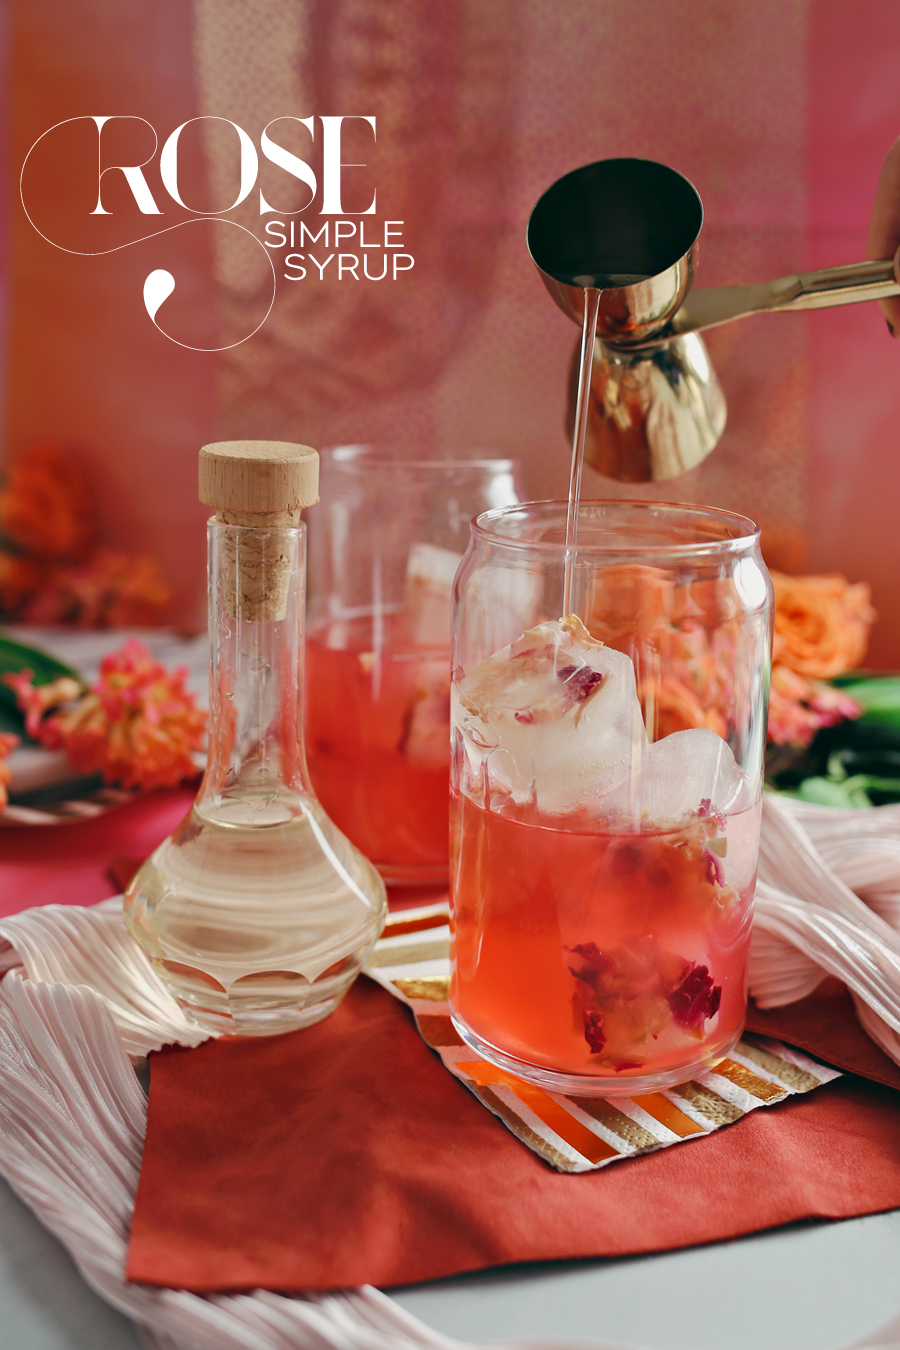 Rose-Simple-Syrup-Recipe-Dine-X-Design.jpg